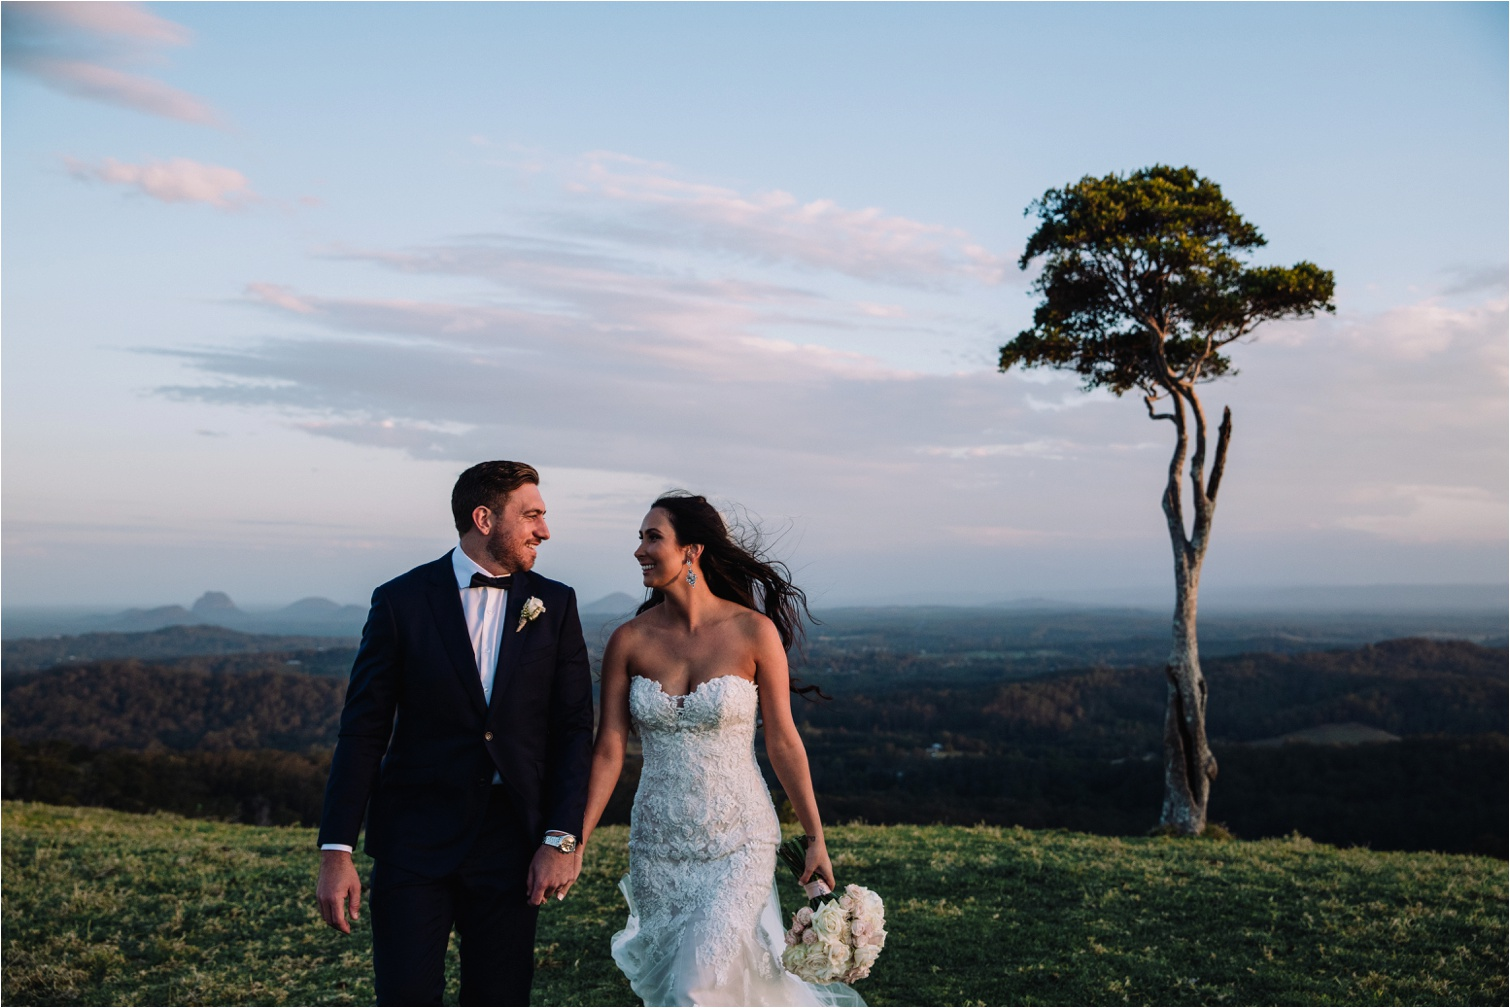 Maleny Manor Wedding Photography - Gold Coast Wedding Photographer_0047.jpg